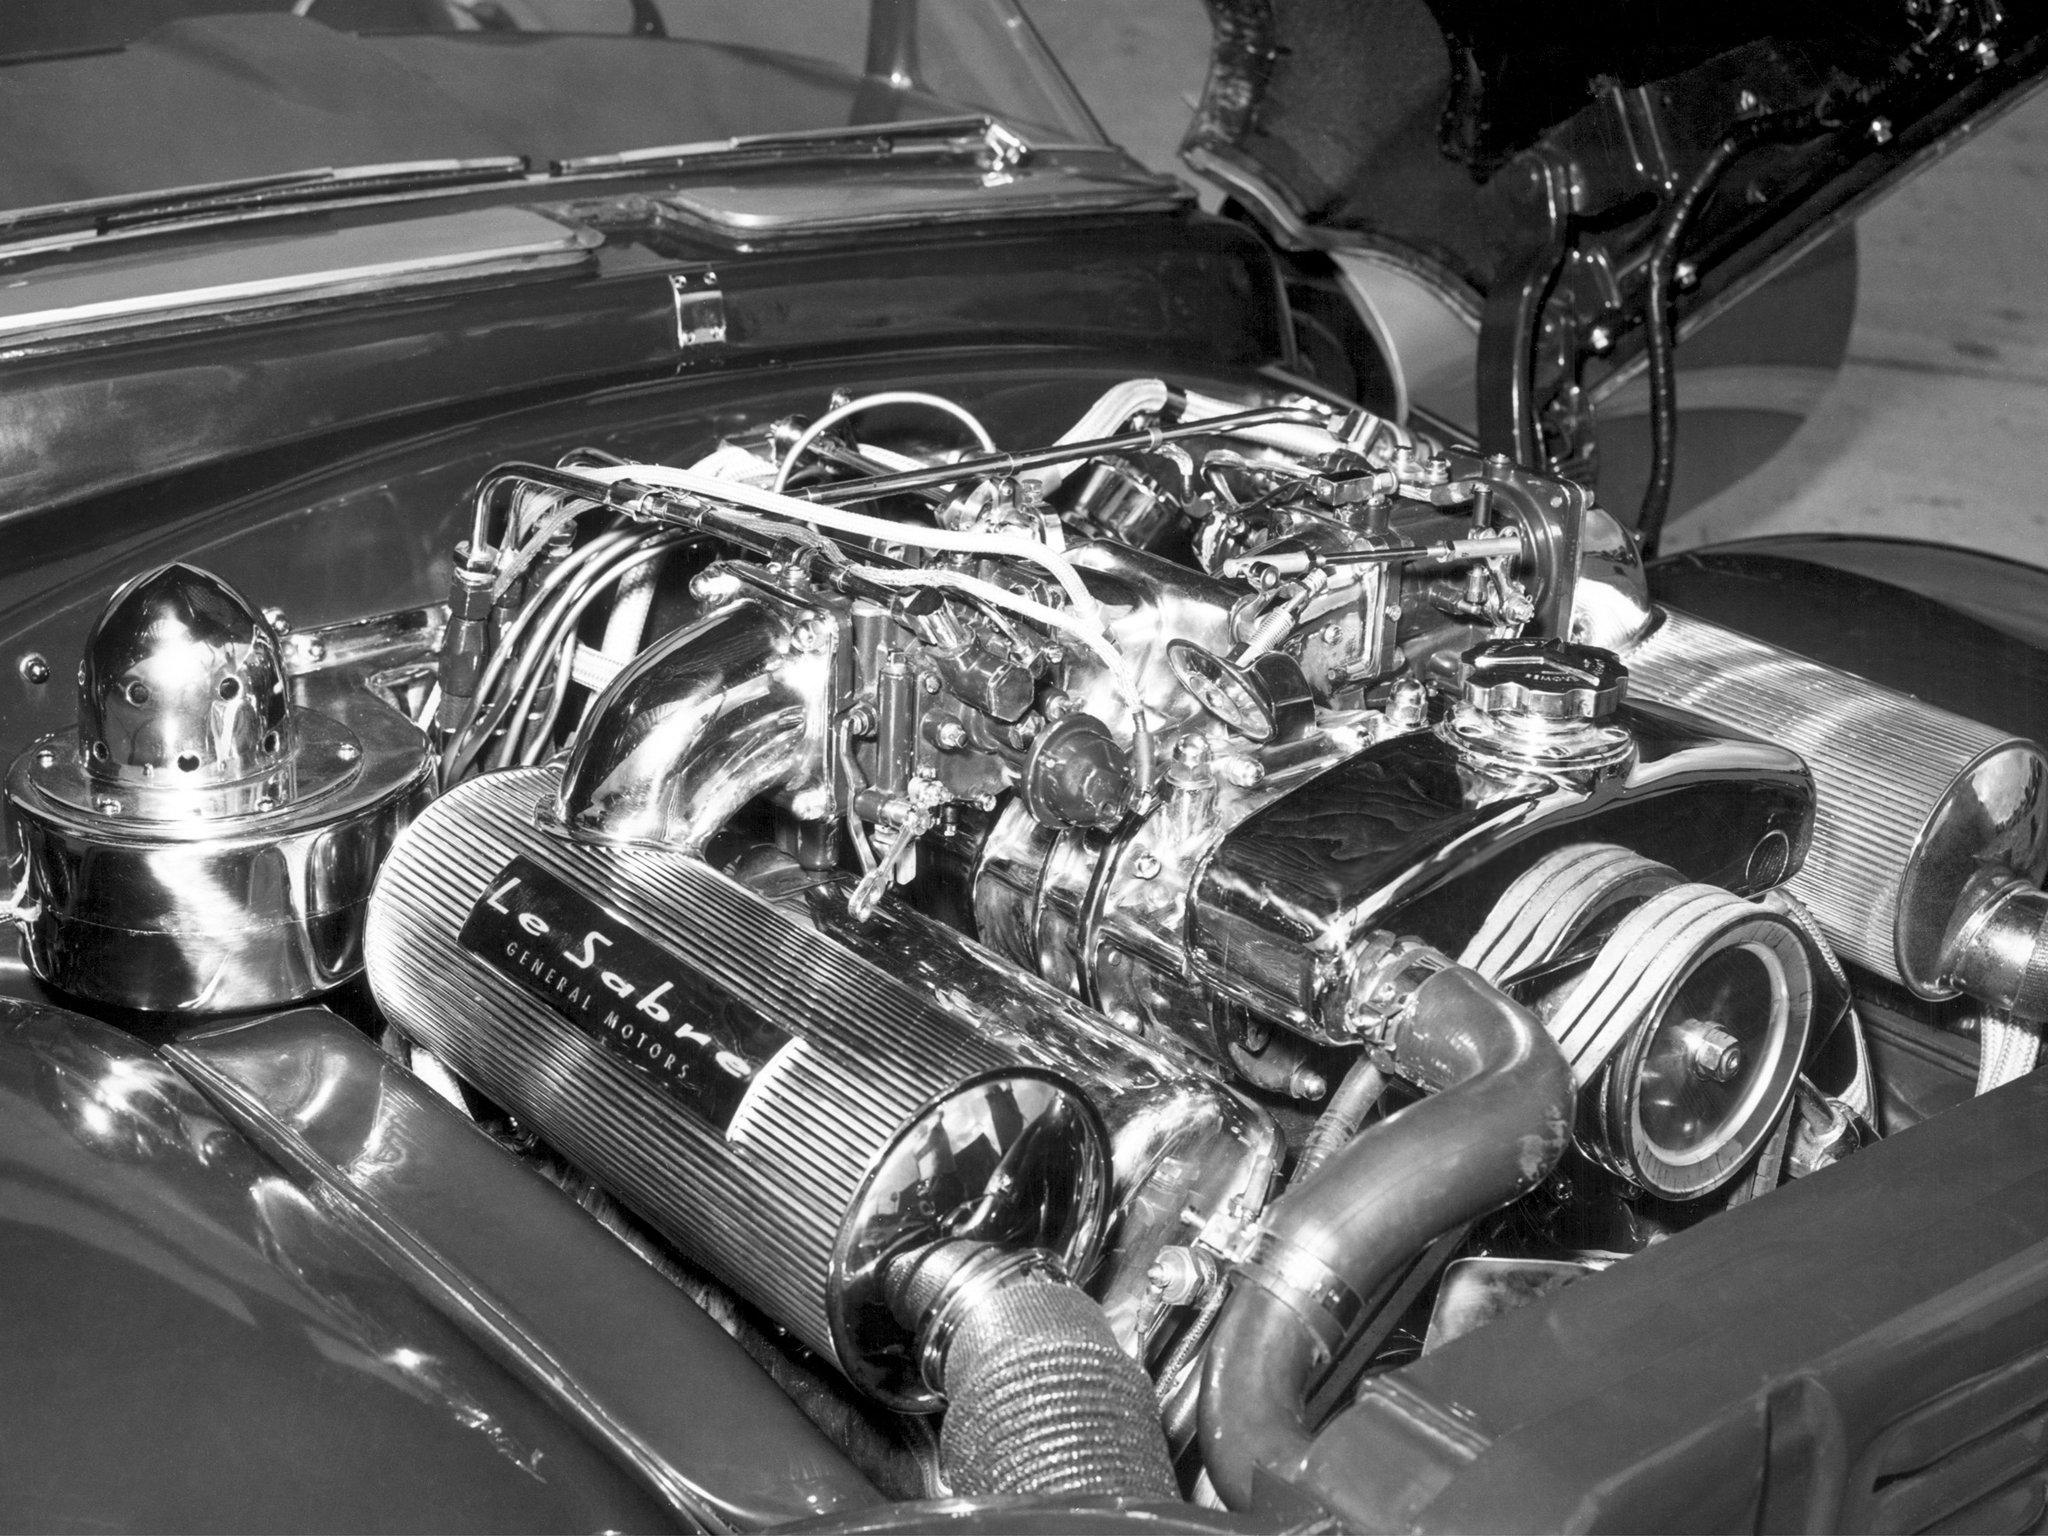 Buick Le Sabre engine